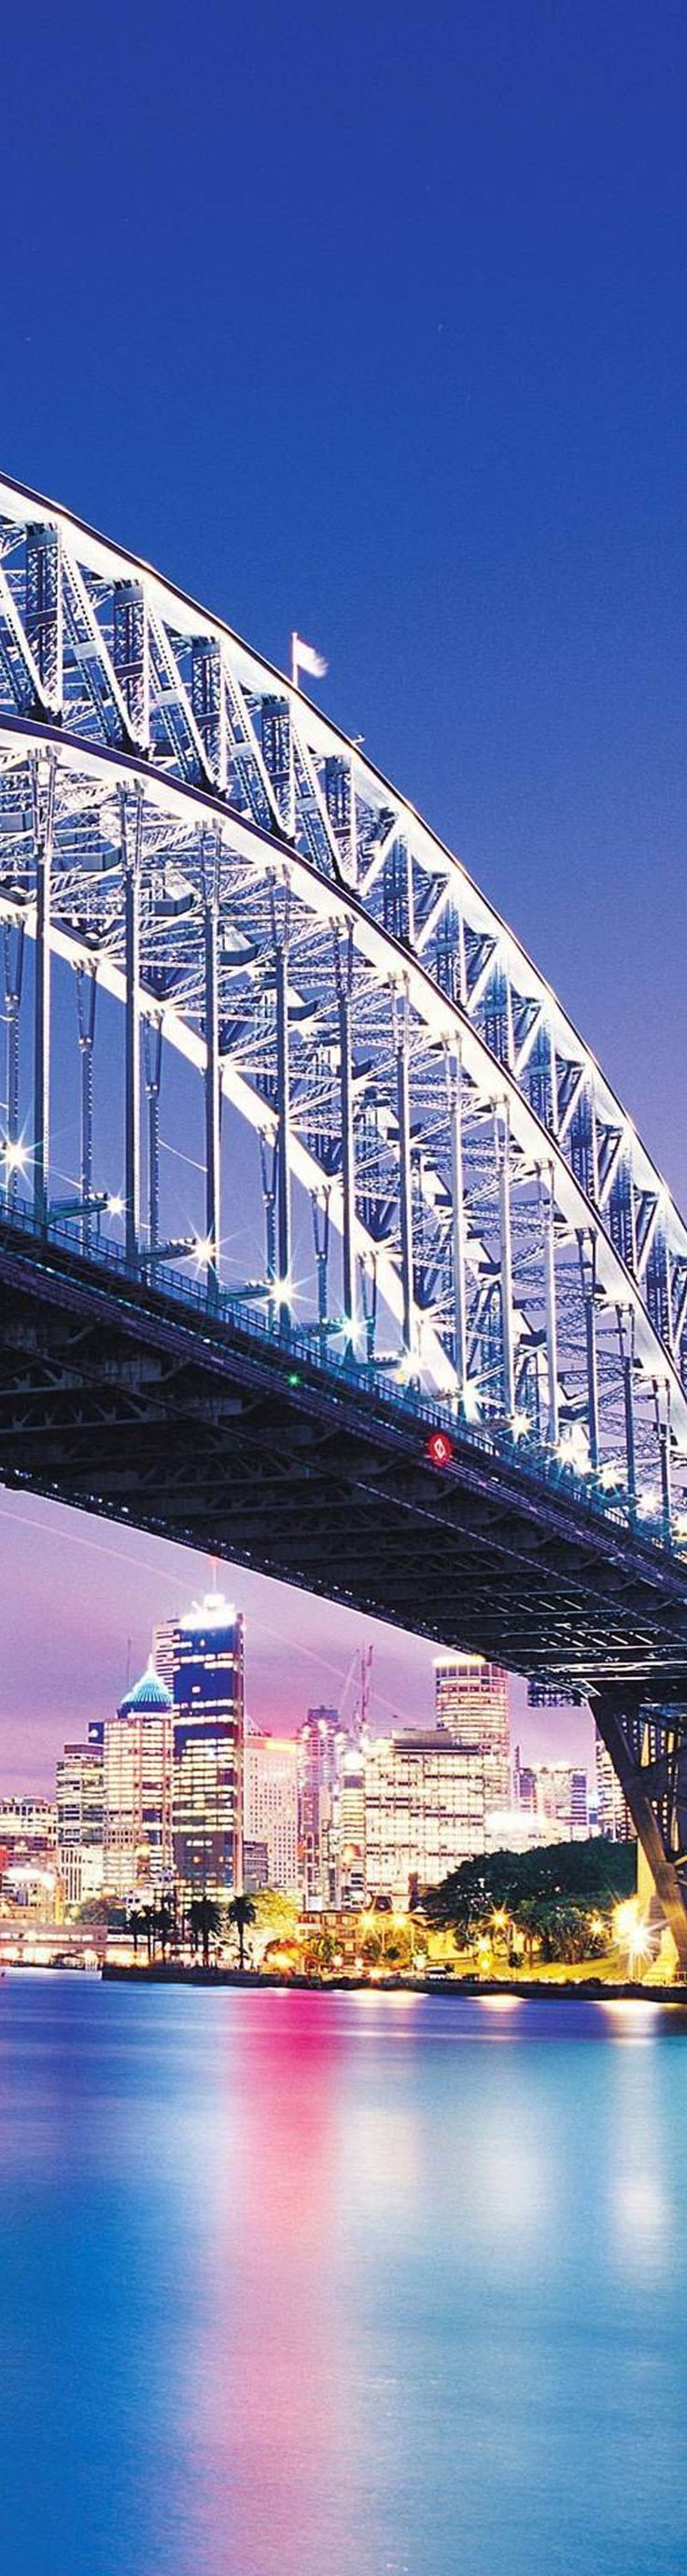 Sydney Harbour Bridge, stunning image. NSW, Australia....www.facebook.com/loveswish